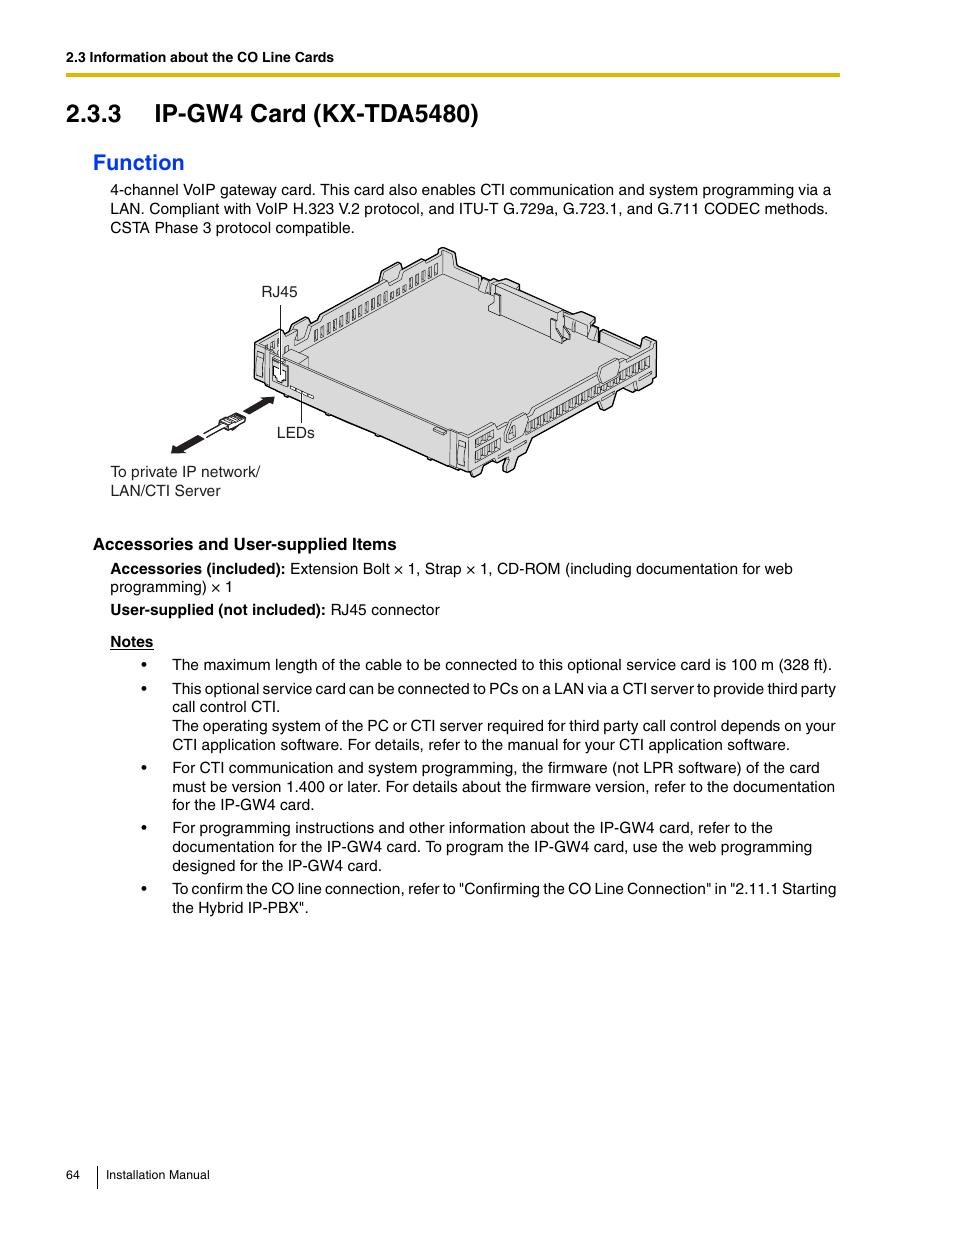 3 ip-gw4 card (kx-tda5480), Function | Panasonic HYBRID IP